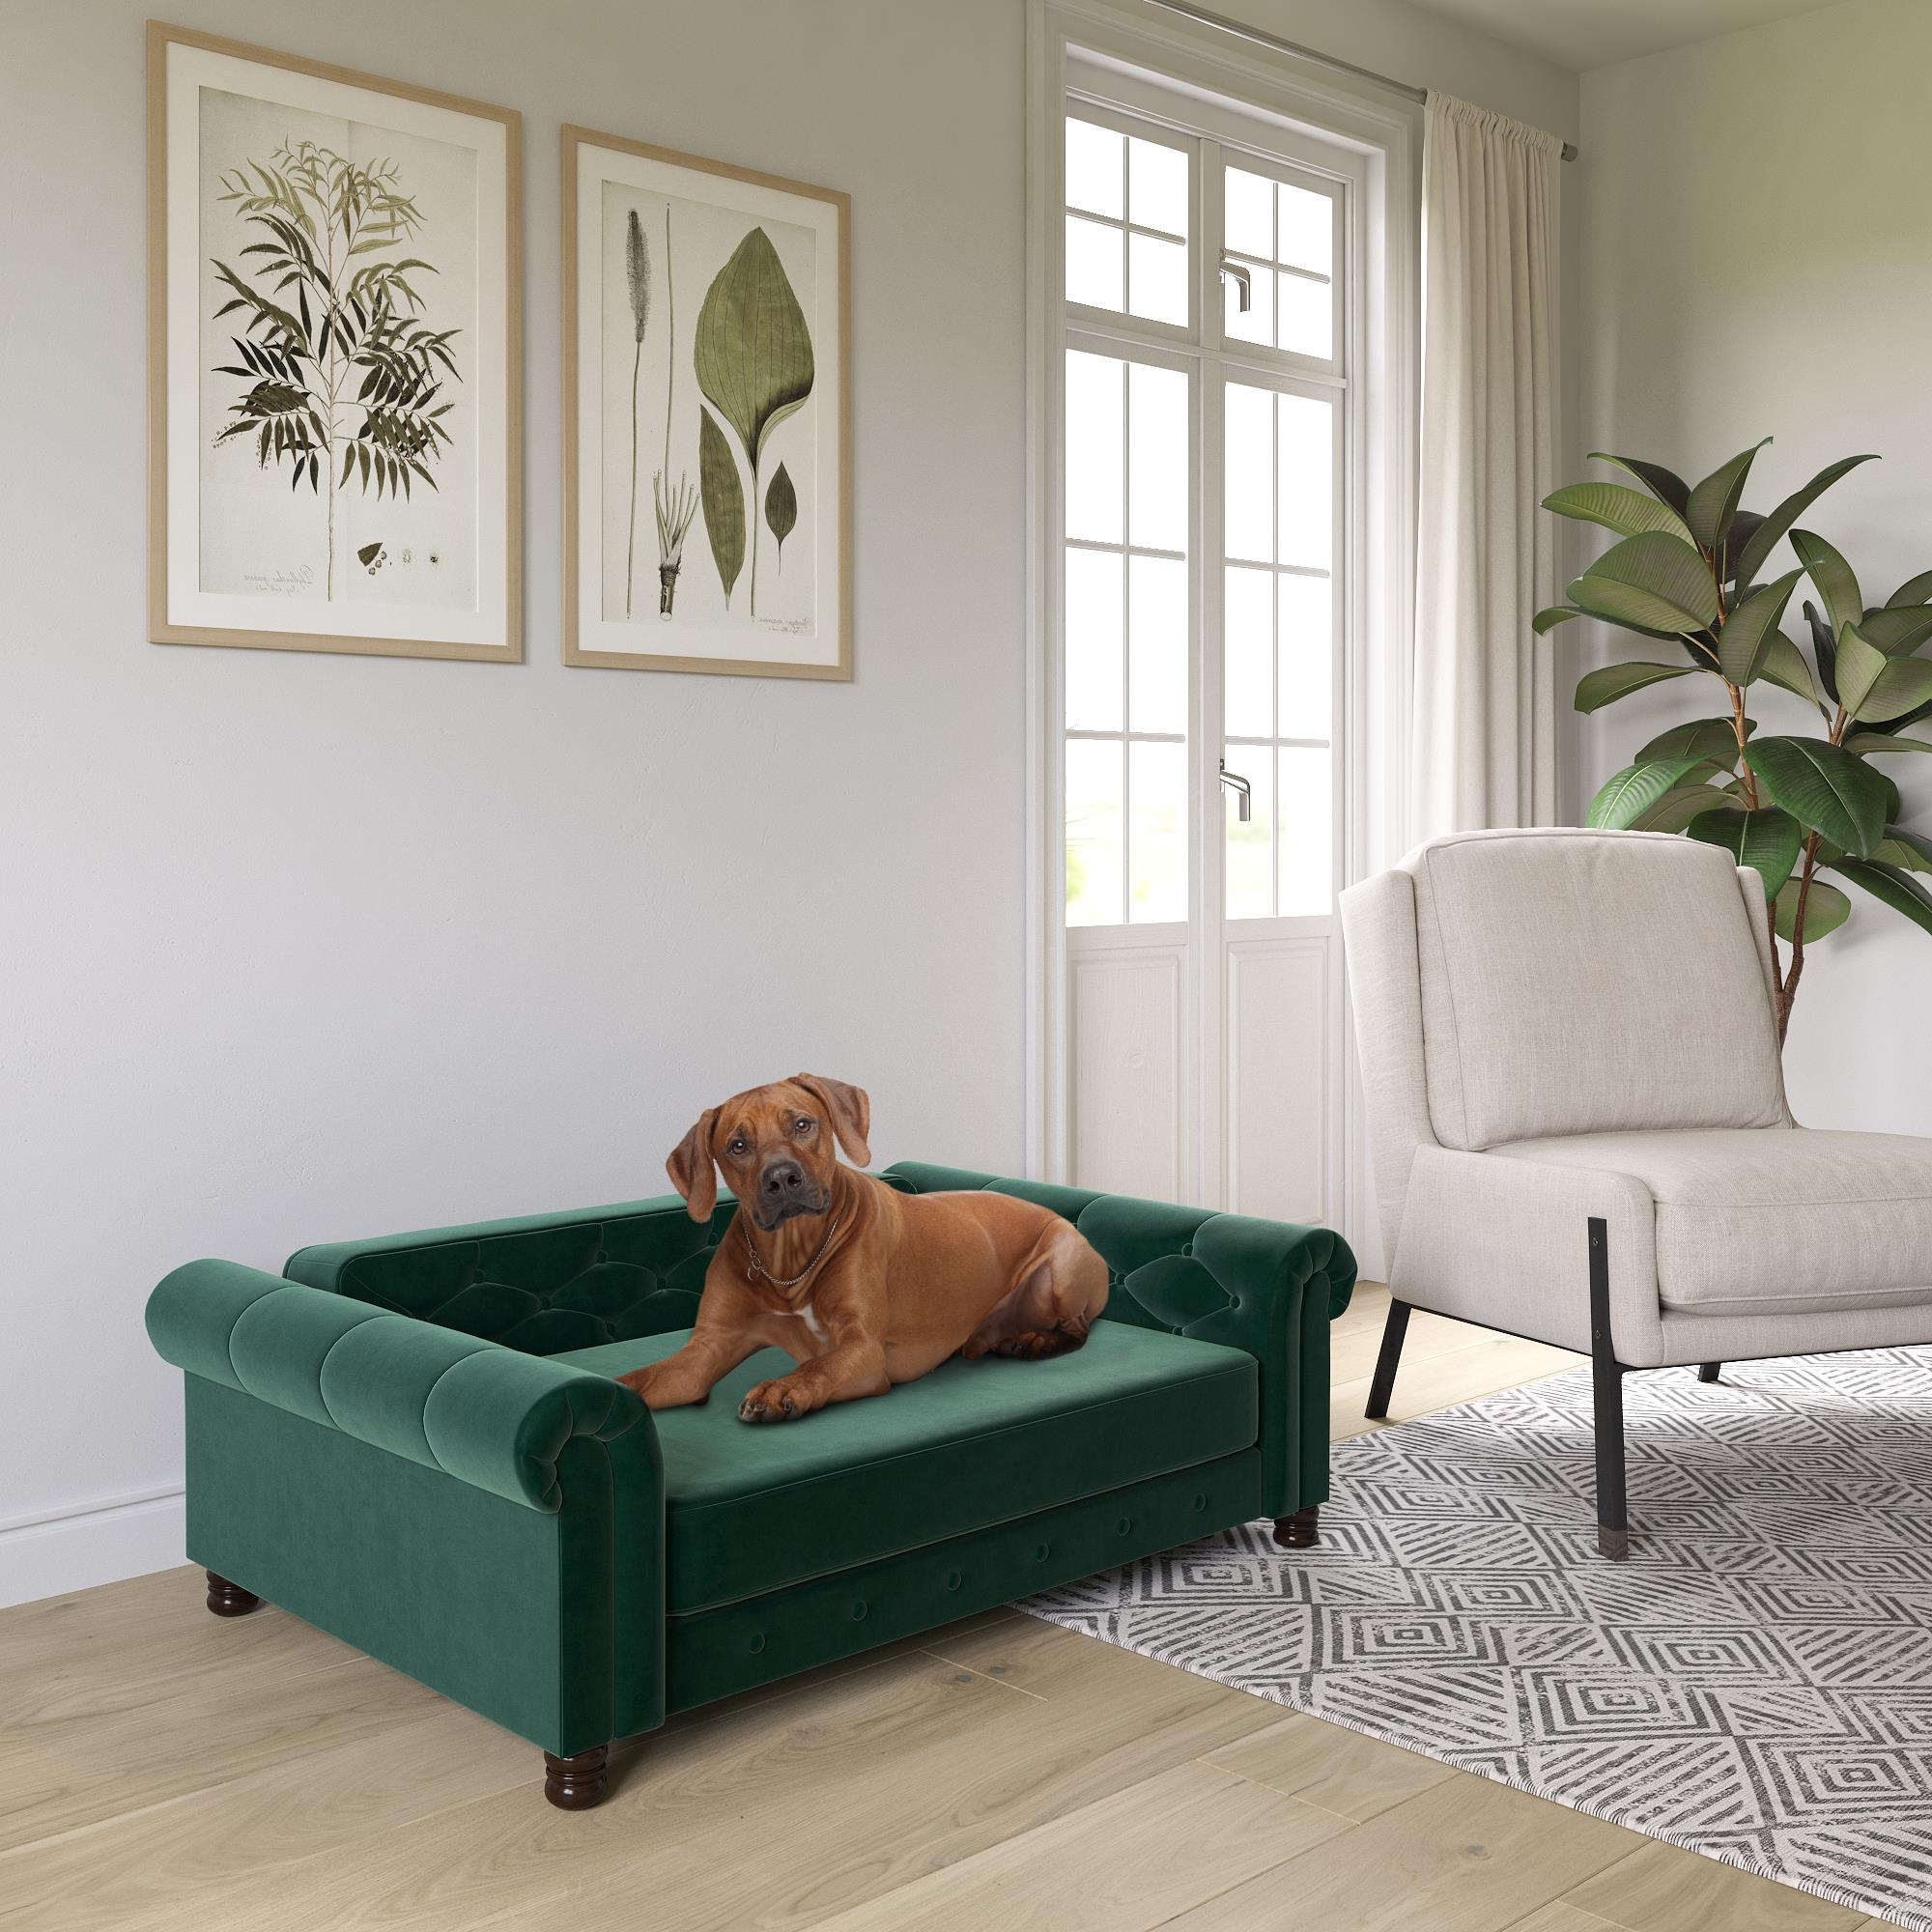 Picture of: Ollie Hutch Felix Pet Sofa Large Size Pet Bed Green Velvet Walmart Com Walmart Com